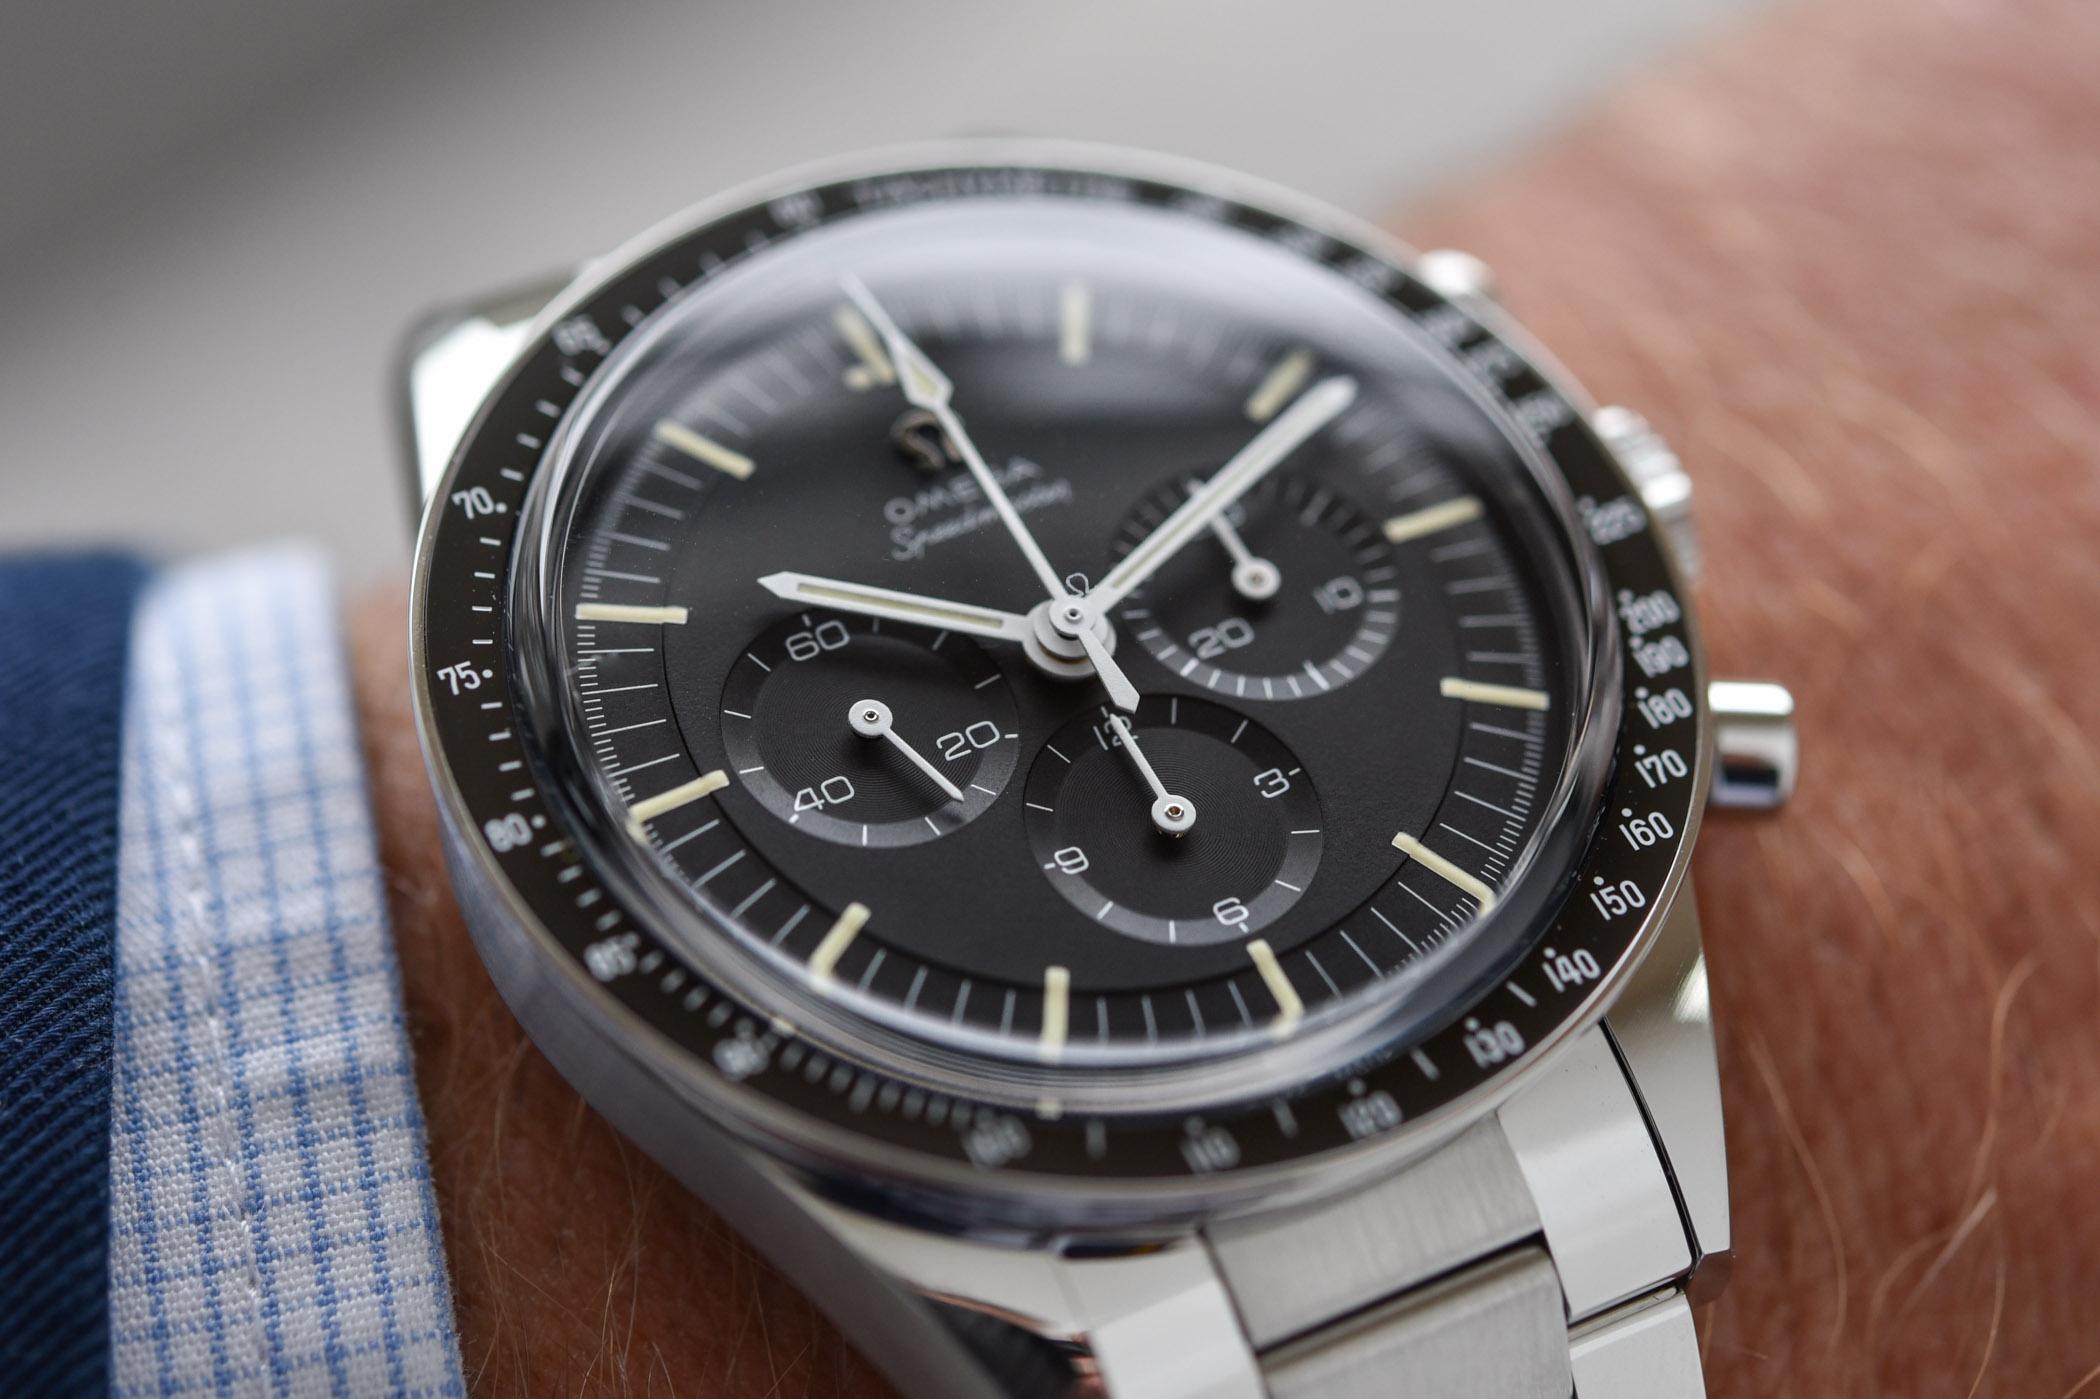 Omega Speedmaster Moonwatch Calibre 321 Ed White